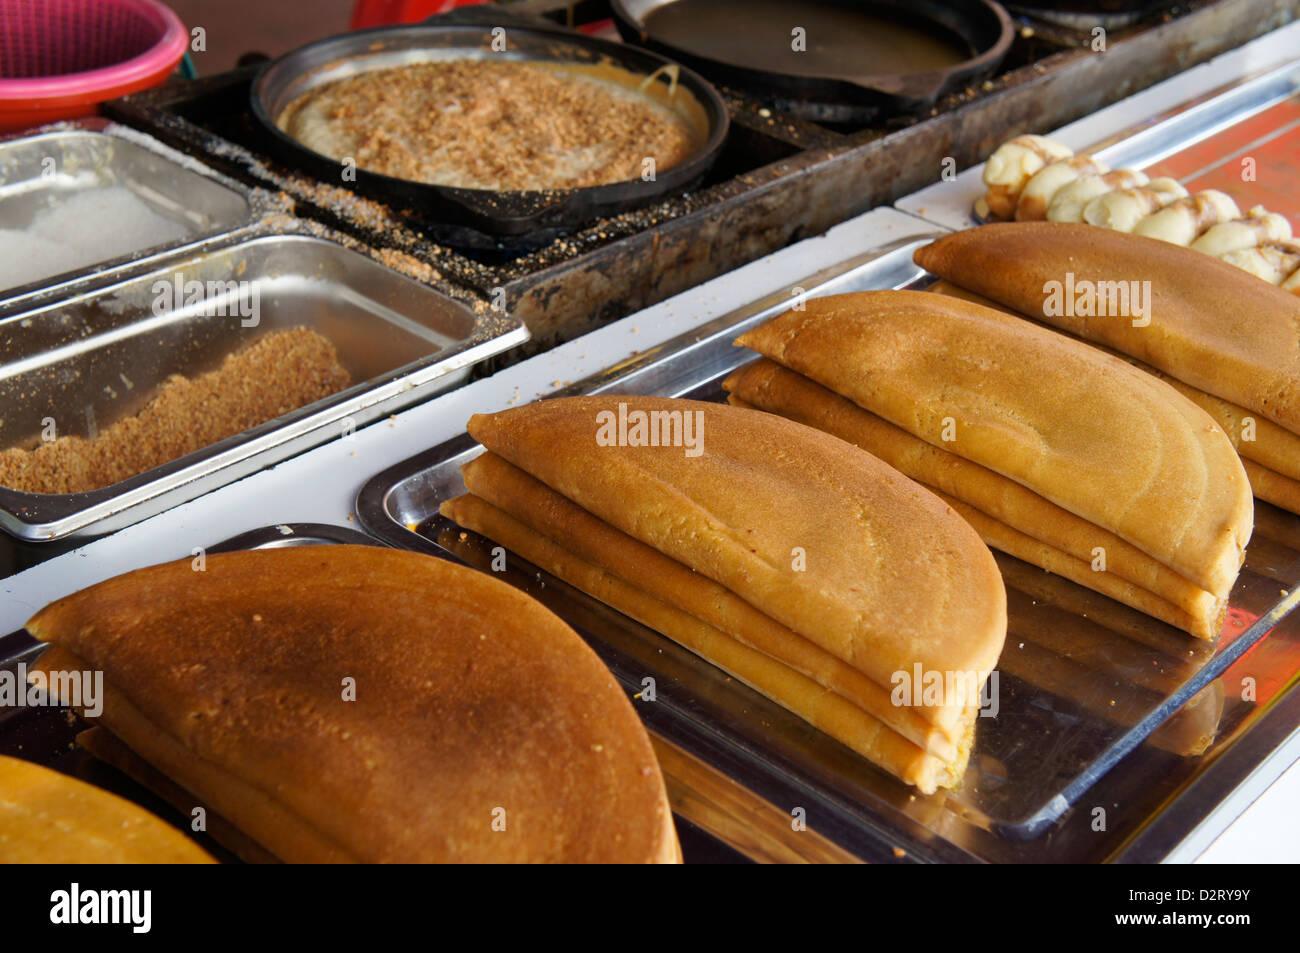 Apam balik (turnover pancake) Malaysian version of pancake with filling of sugar, peanuts and creamy sweet corn - Stock Image